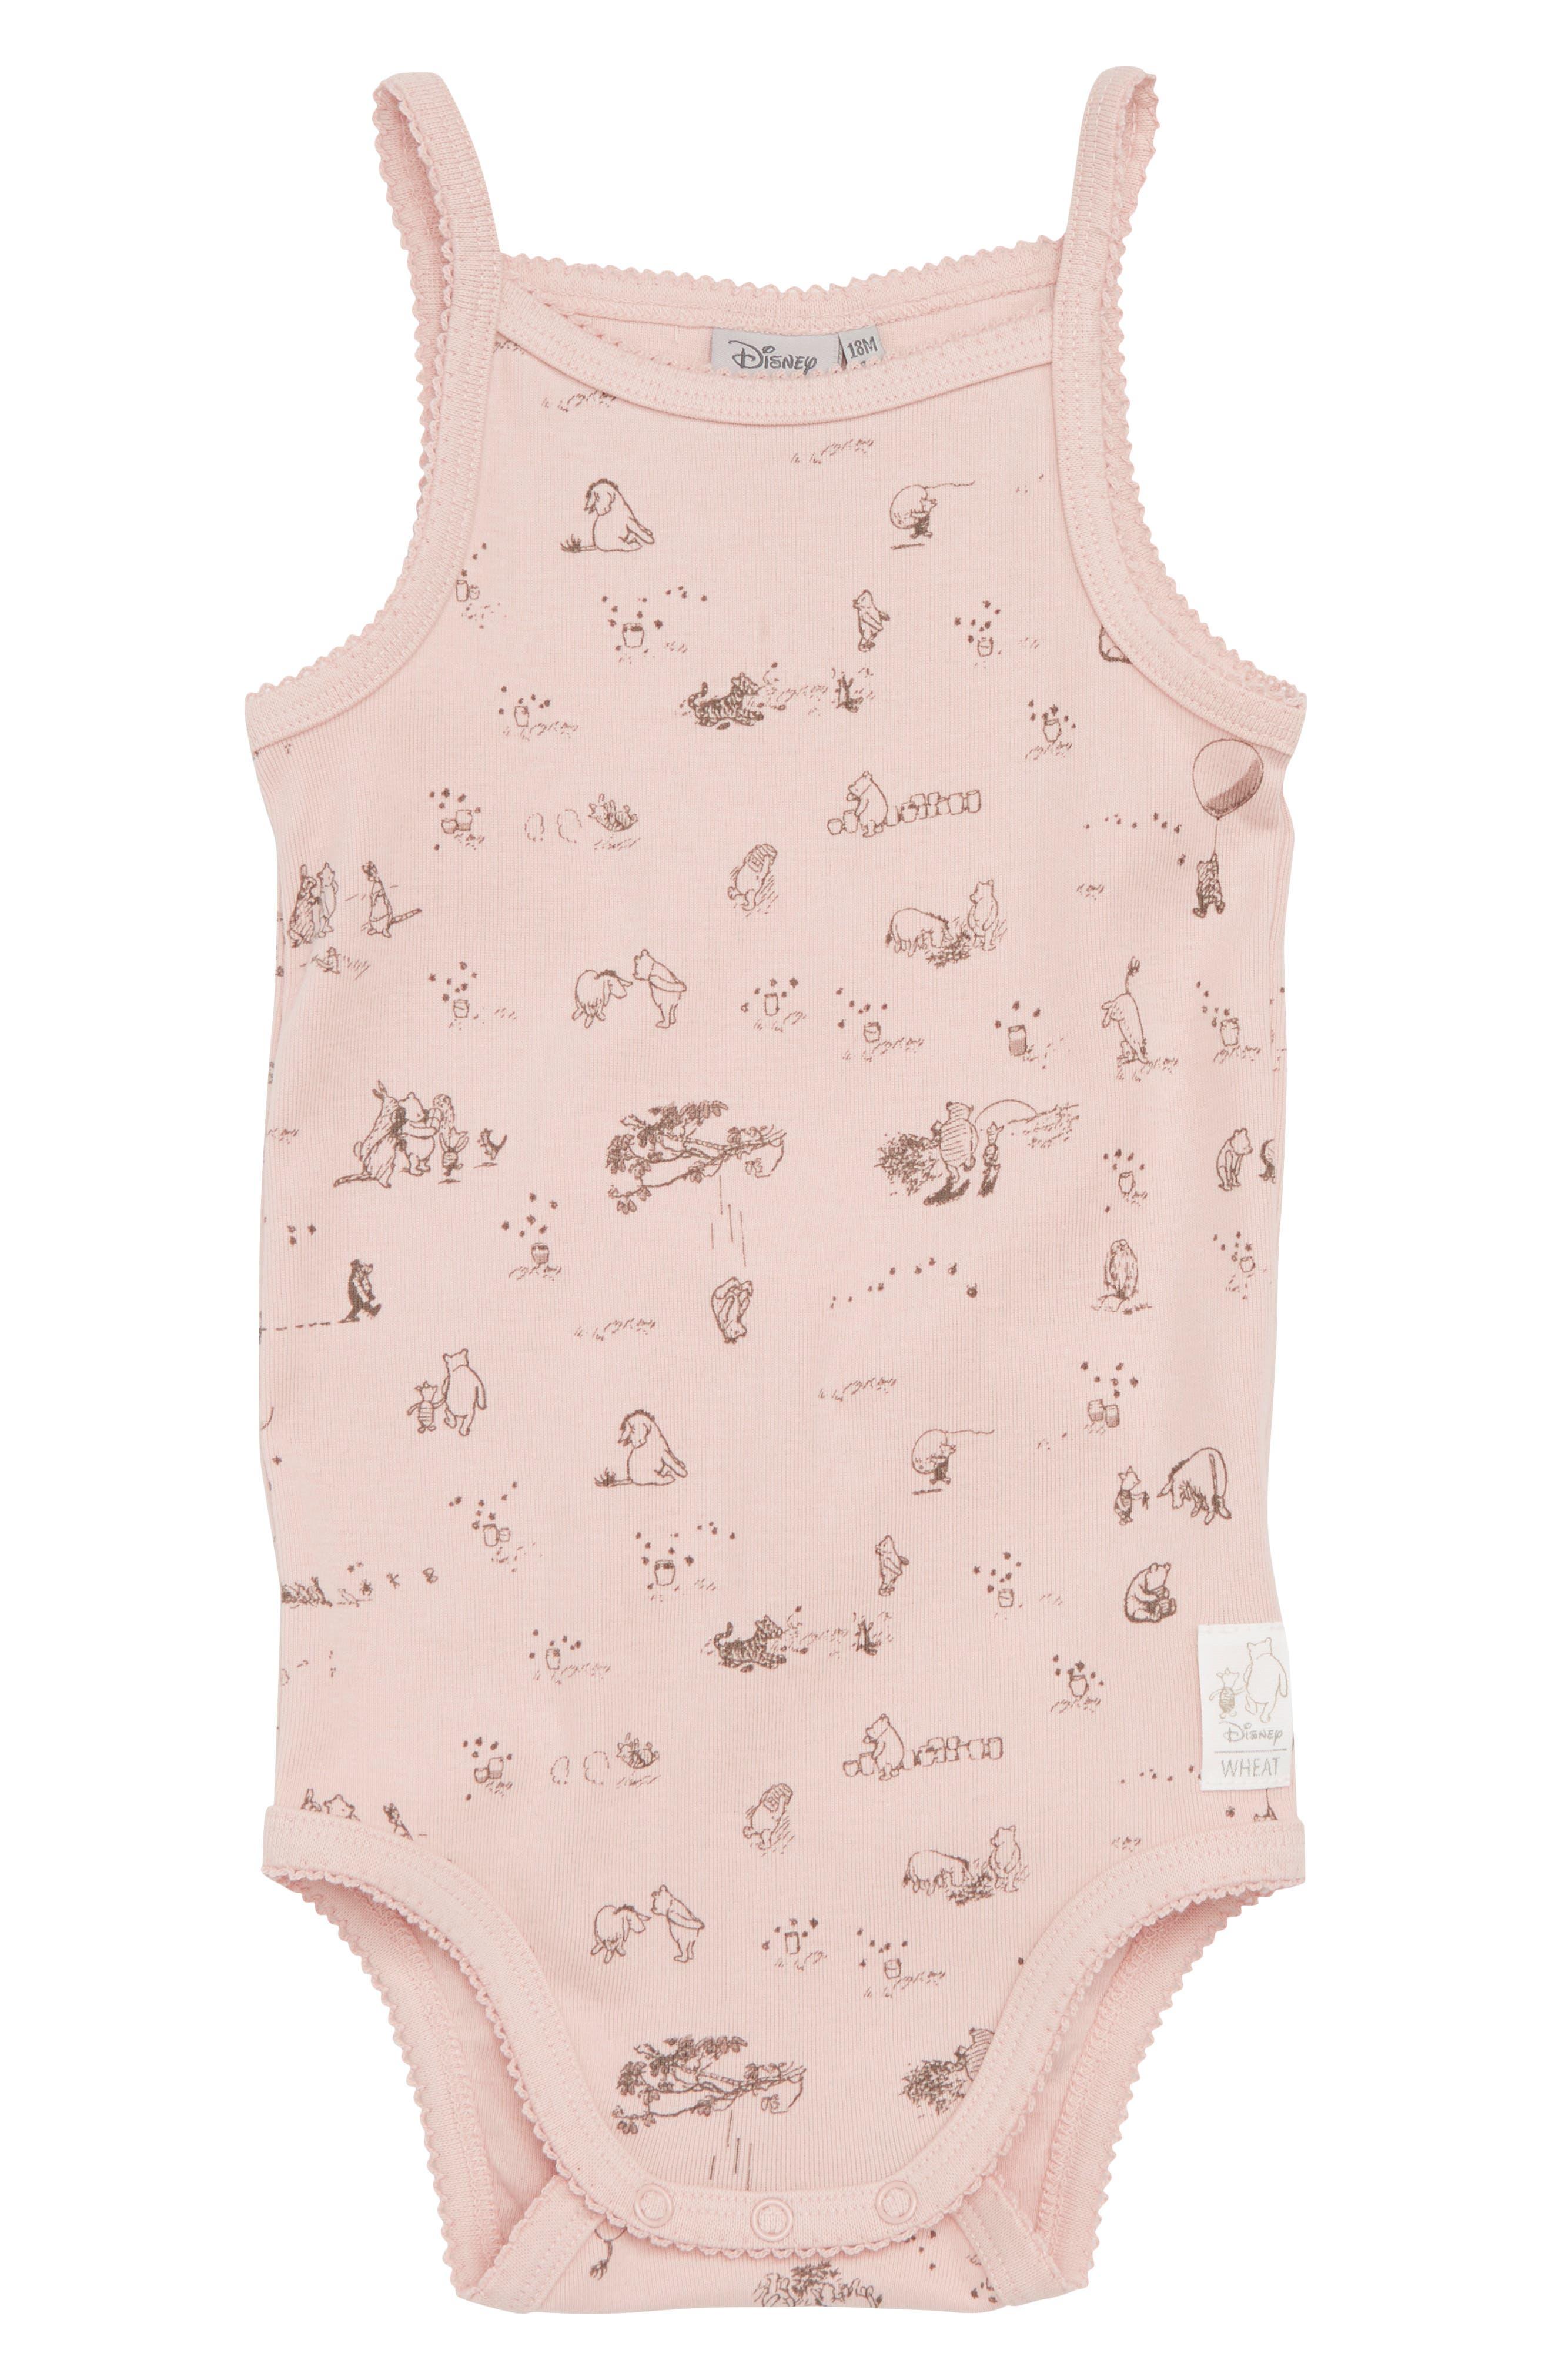 x Disney<sup>®</sup> Winnie the Pooh Organic Cotton Bodysuit,                             Main thumbnail 1, color,                             652